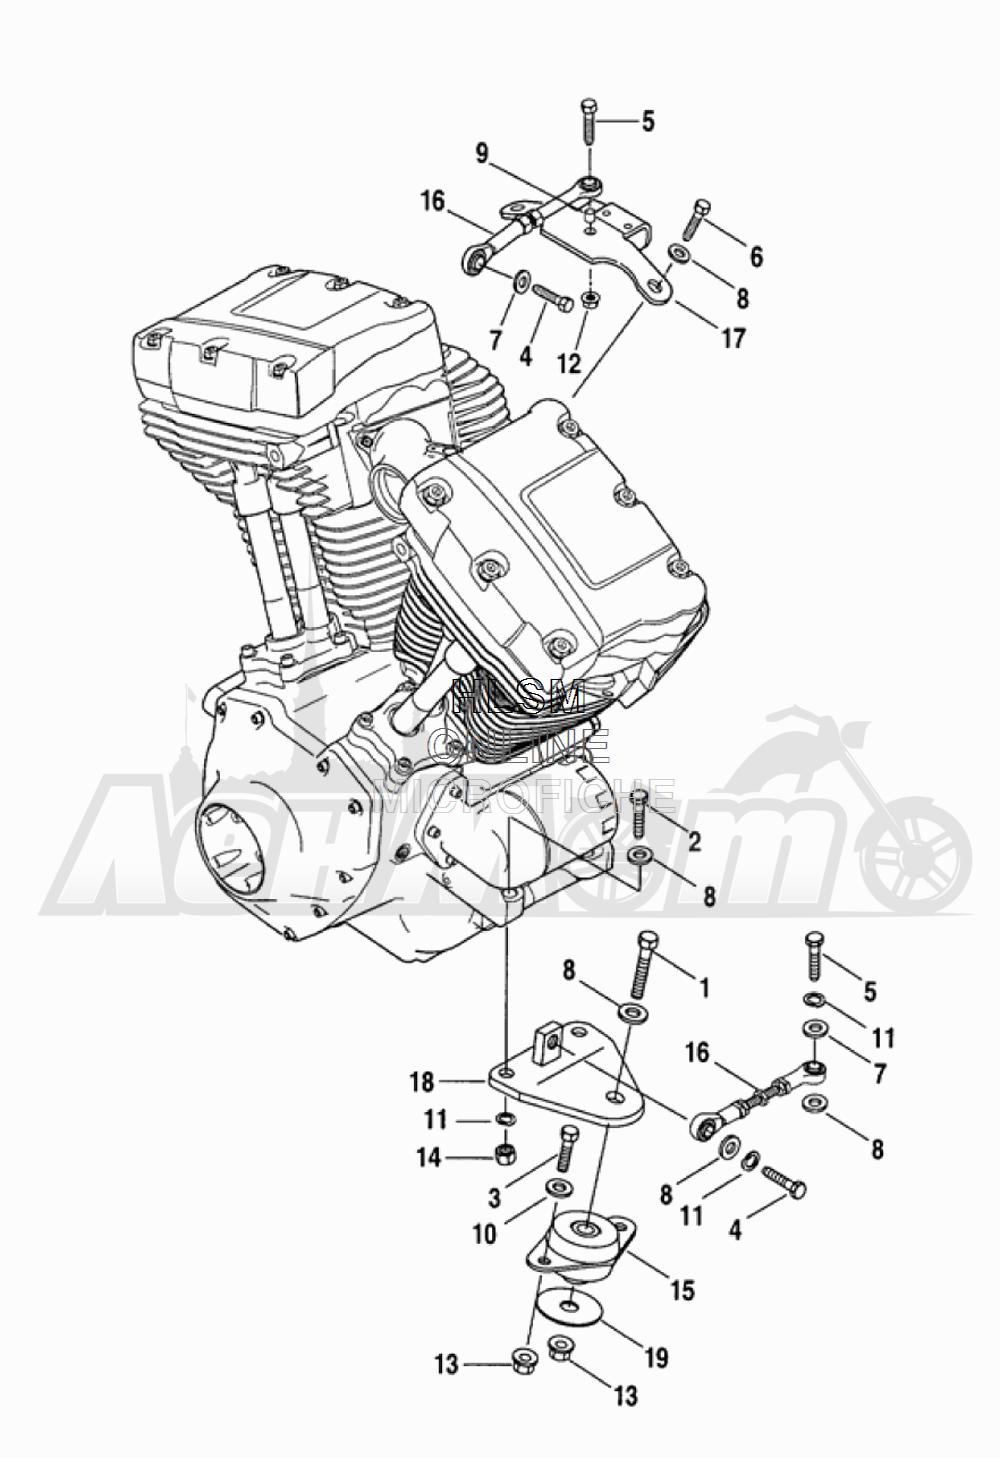 Запчасти для Мотоцикла Harley-Davidson 2005 FLTRI ROAD GLIDE® (INJECTION) (FS) Раздел: ENGINE MOUNTS W/ STABILIZER LINK | опоры двигателя вместе с стабилизатор